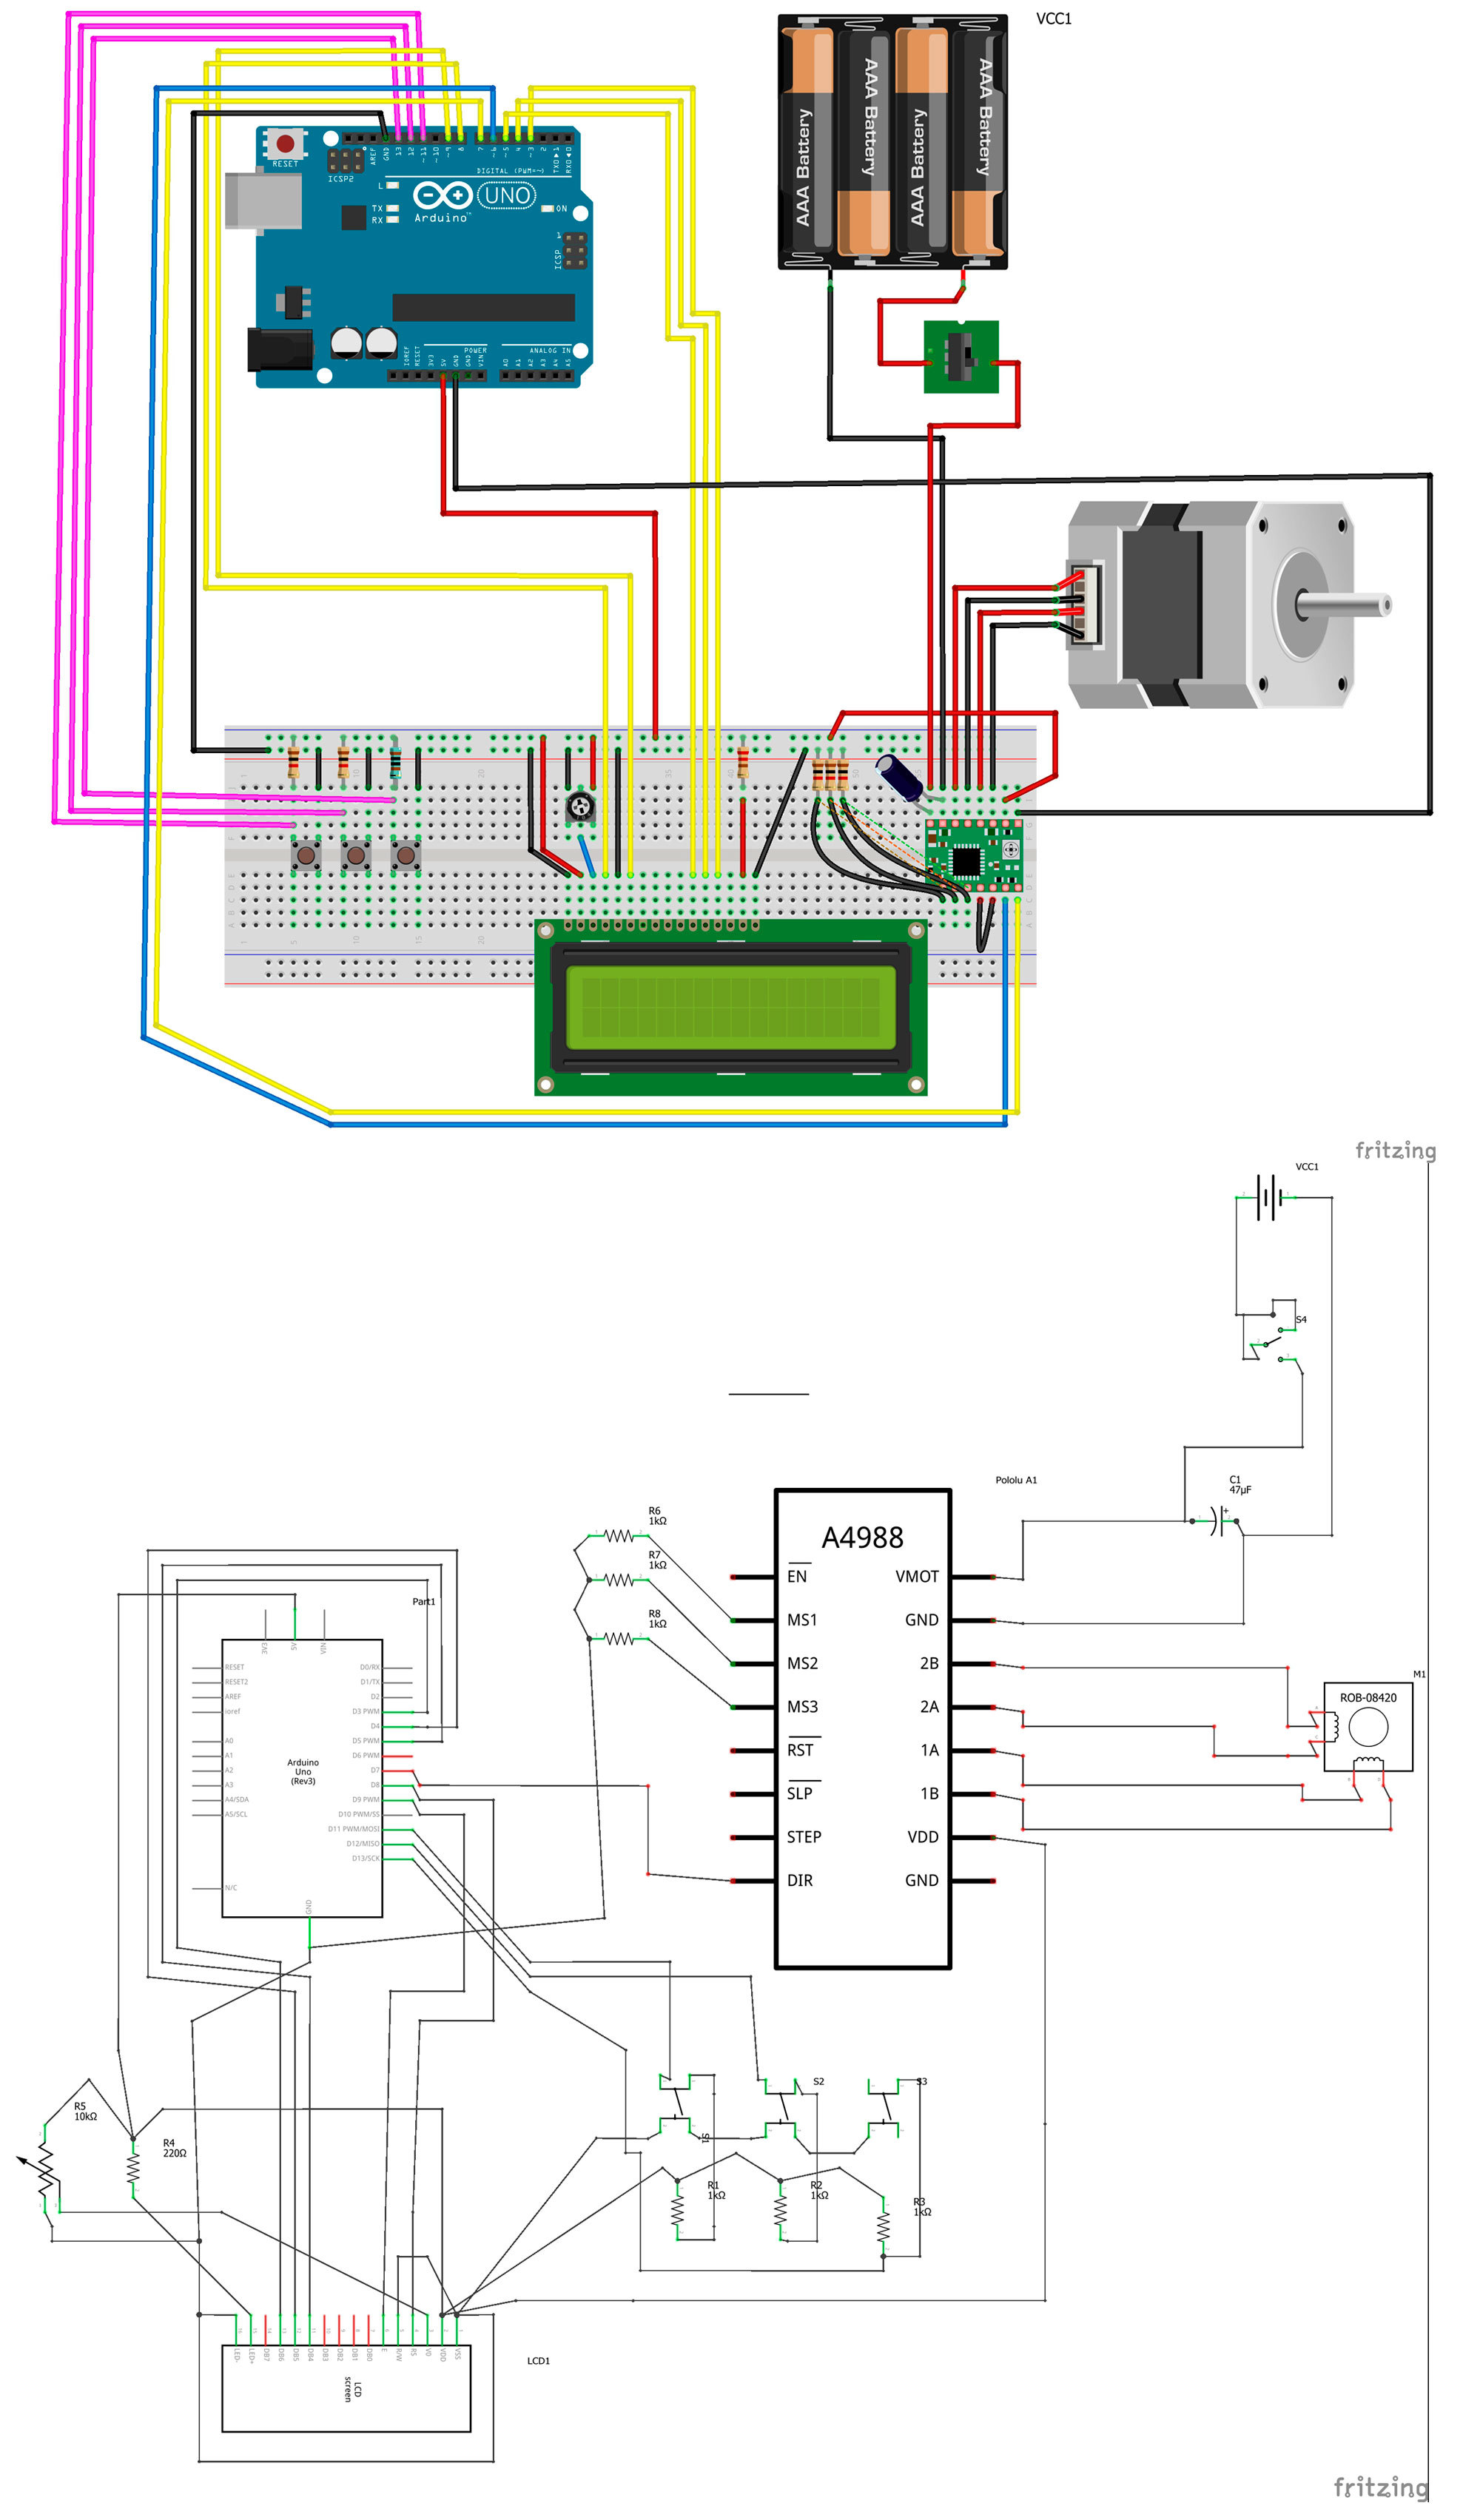 Barn Door Astrotracker Beginners Fritzing Forum Ms2 Wiring Diagram Parts Bb 52000x3406 573 Kb